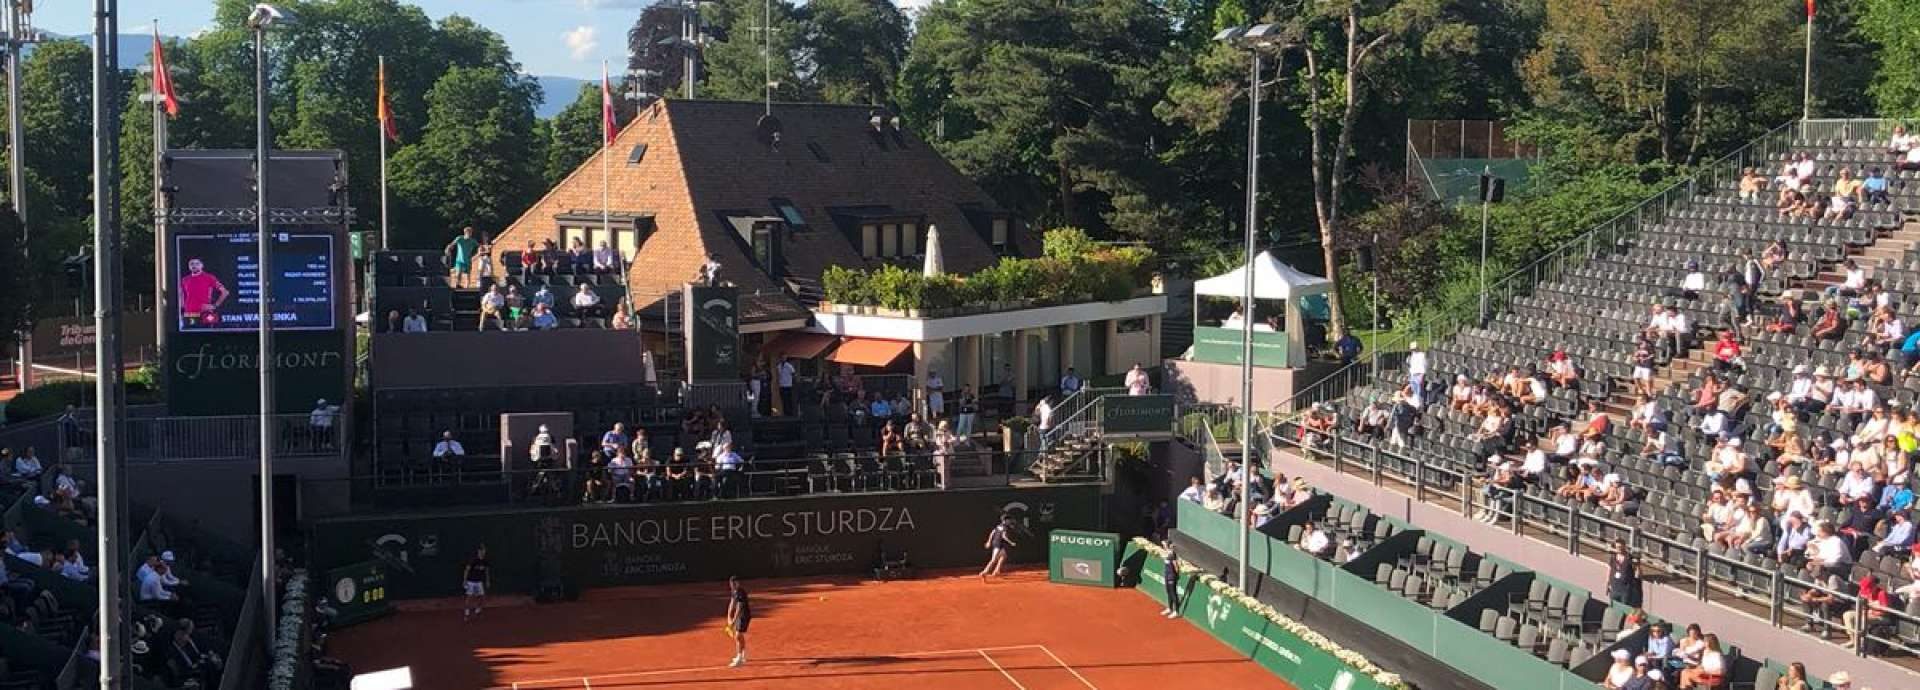 moser-vernet-cie-geneve-06/2018-article-tennis-2